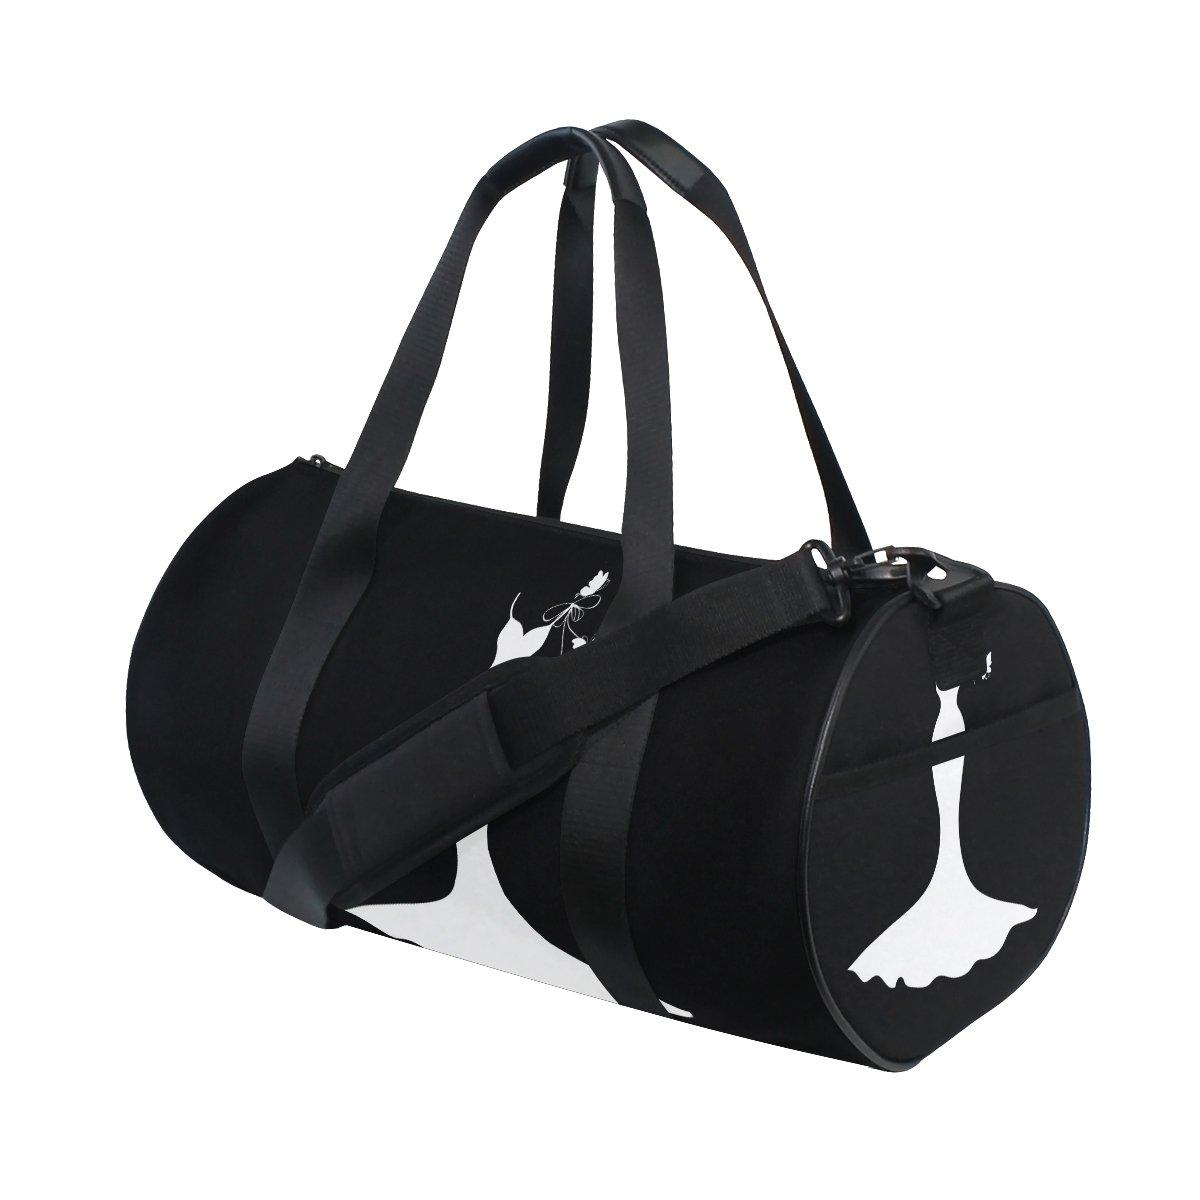 Naanle White Wedding Dress Black Gym bag Sports Travel Duffle Bags for Men Women Boys Girls Kids